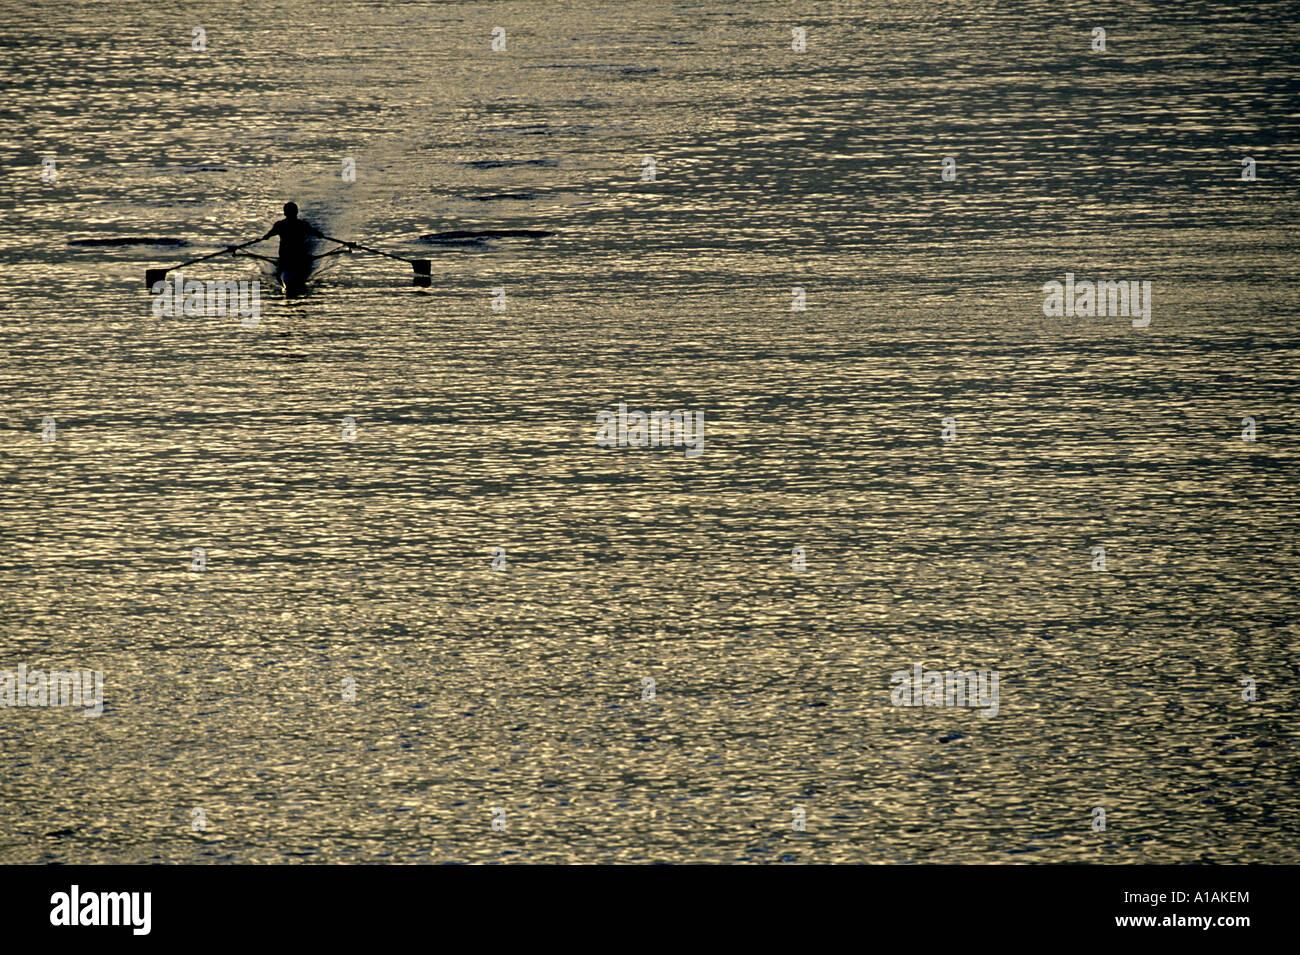 USA, Washington, Seattle, Rowing teams scull through Montlake Cut during Husky Invitational at dawn in Lake Union - Stock Image